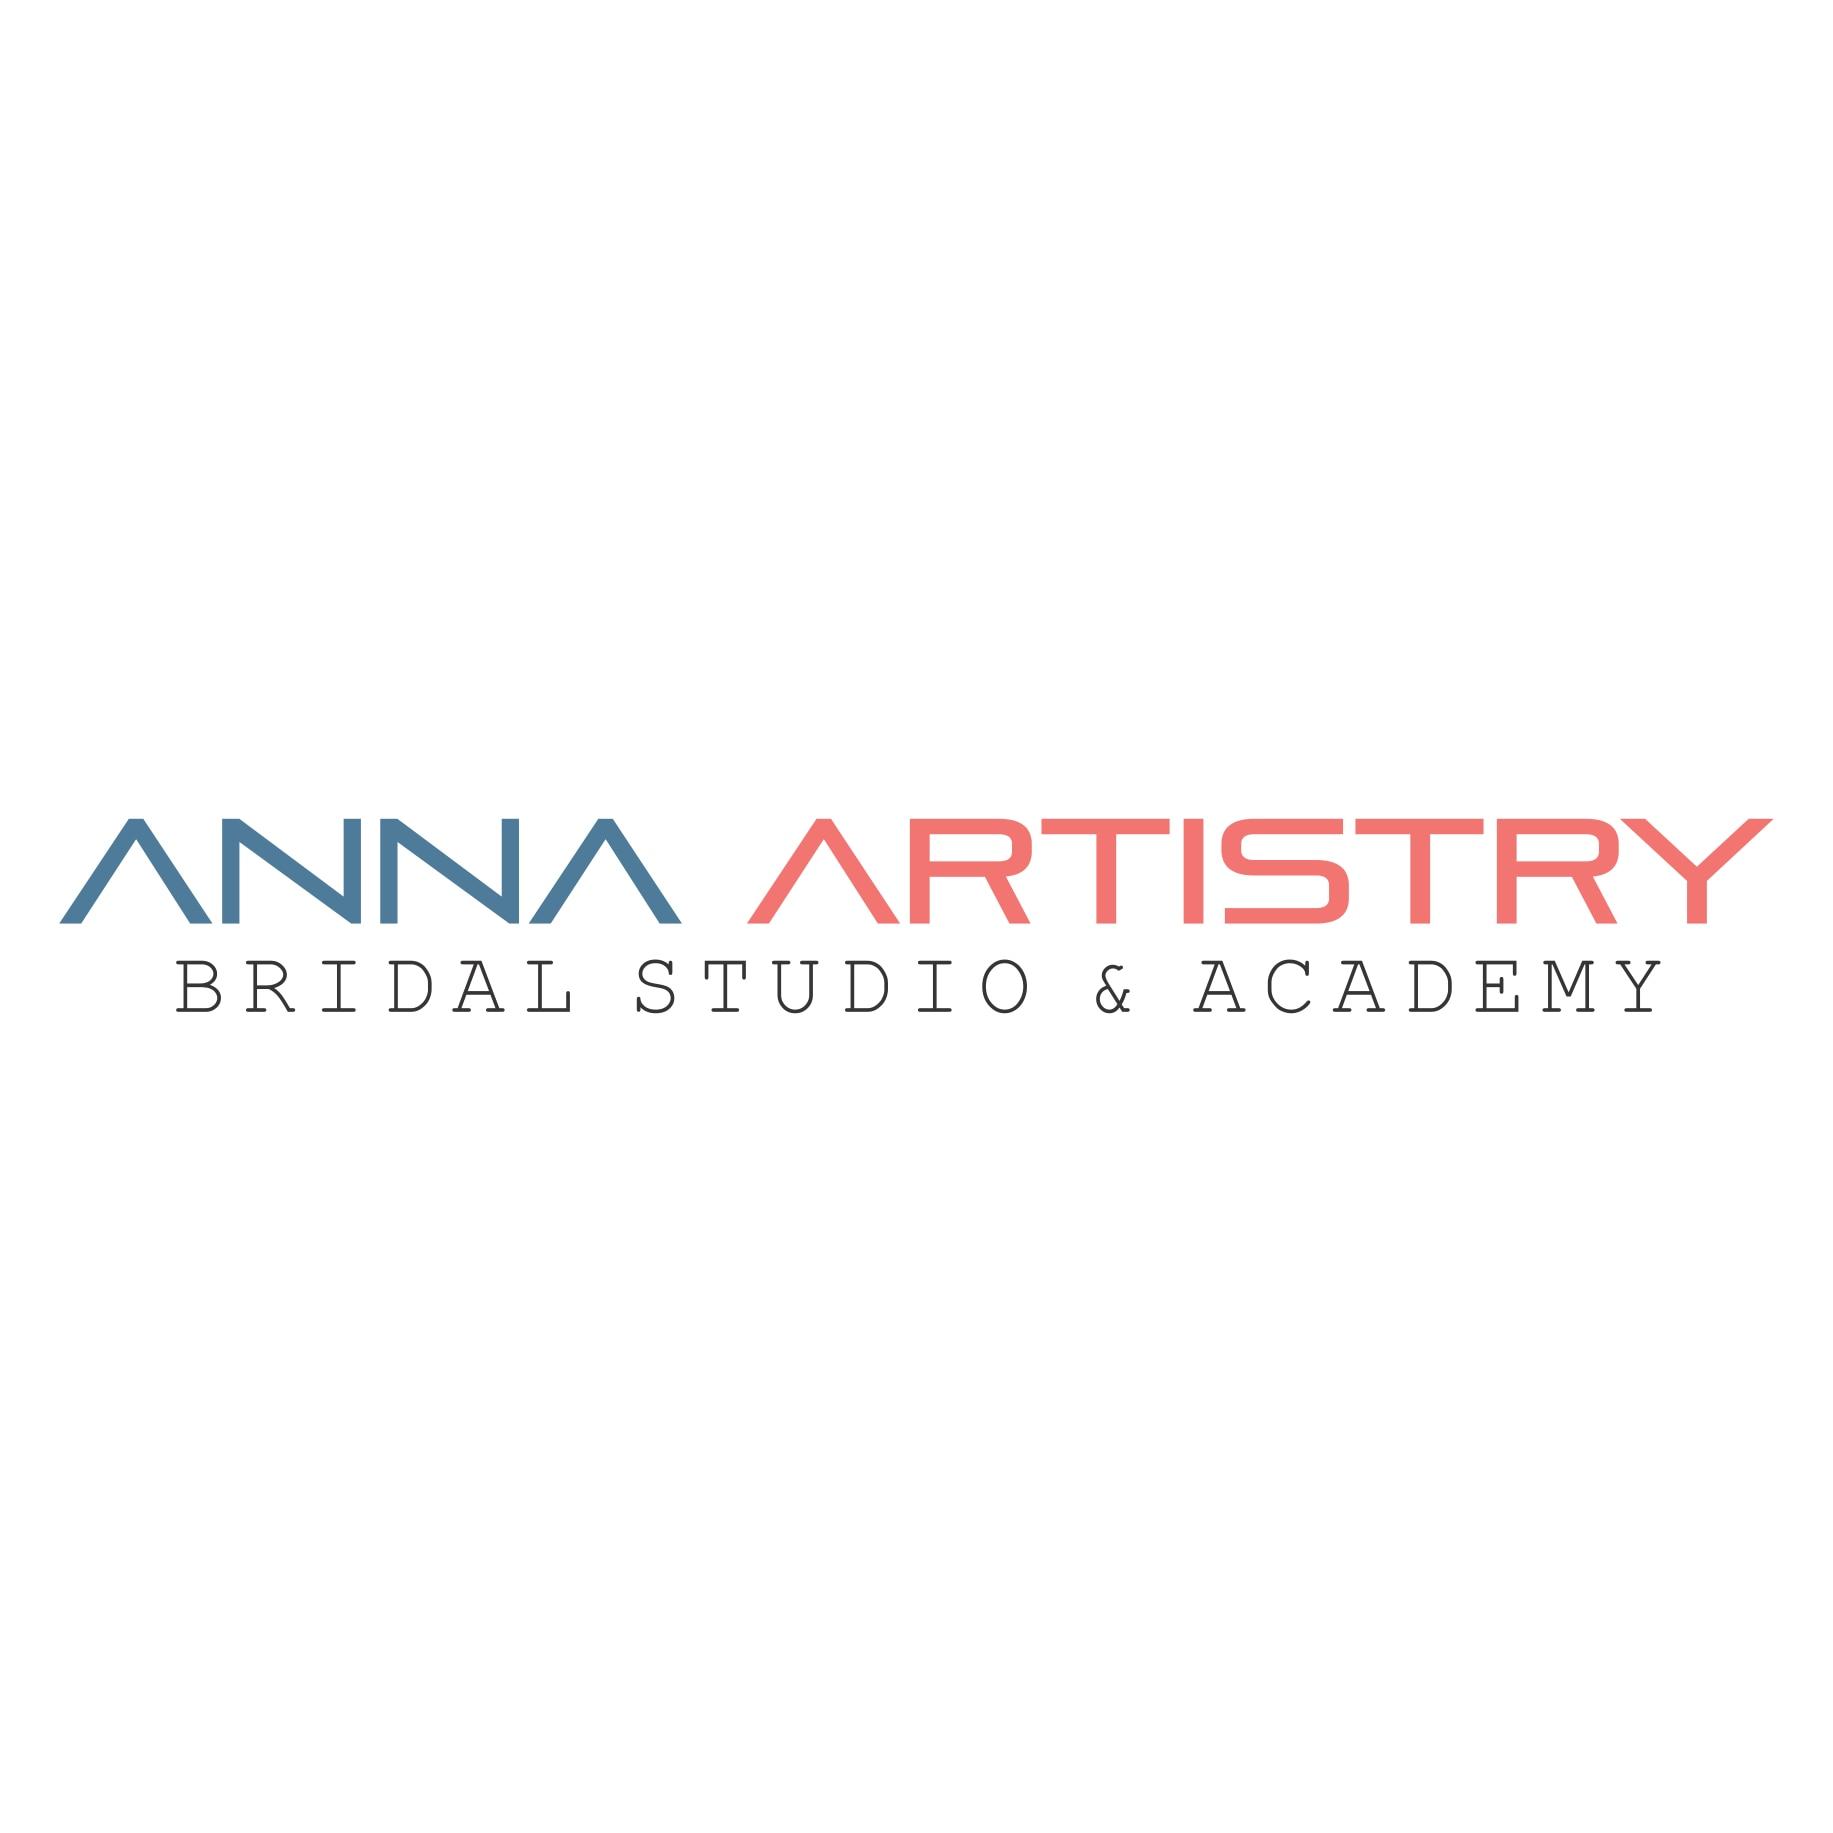 image of Anna Artistry Bridal Studio & Academy